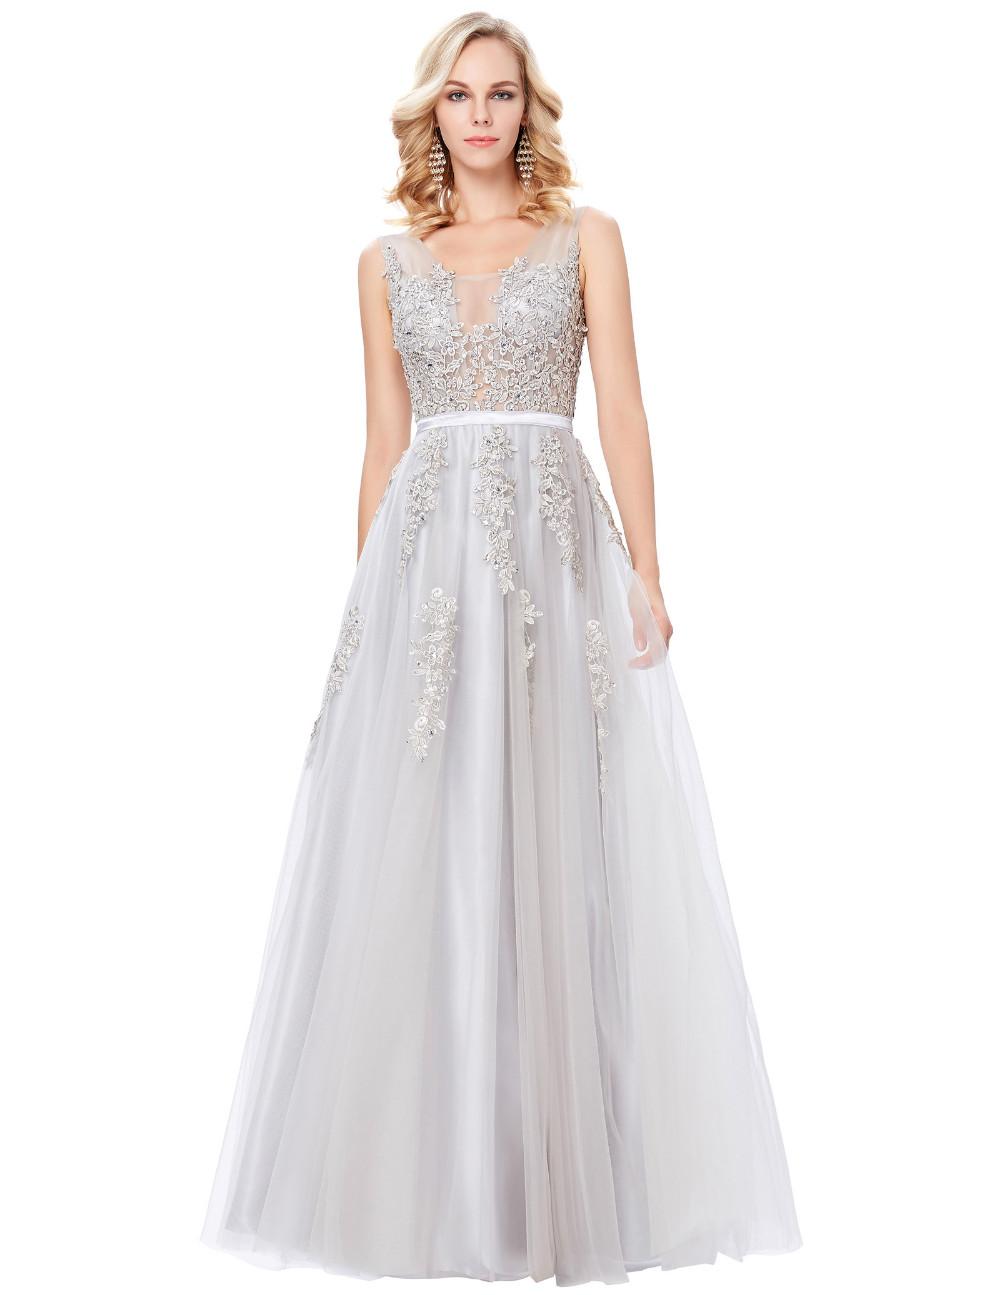 Grace Karin Tulle Appliques Celebrity Prom Dress Sexy V Back Sleeveless Long Royal Blue Robes De Soiree 2017 Longue Prom Dresses 20